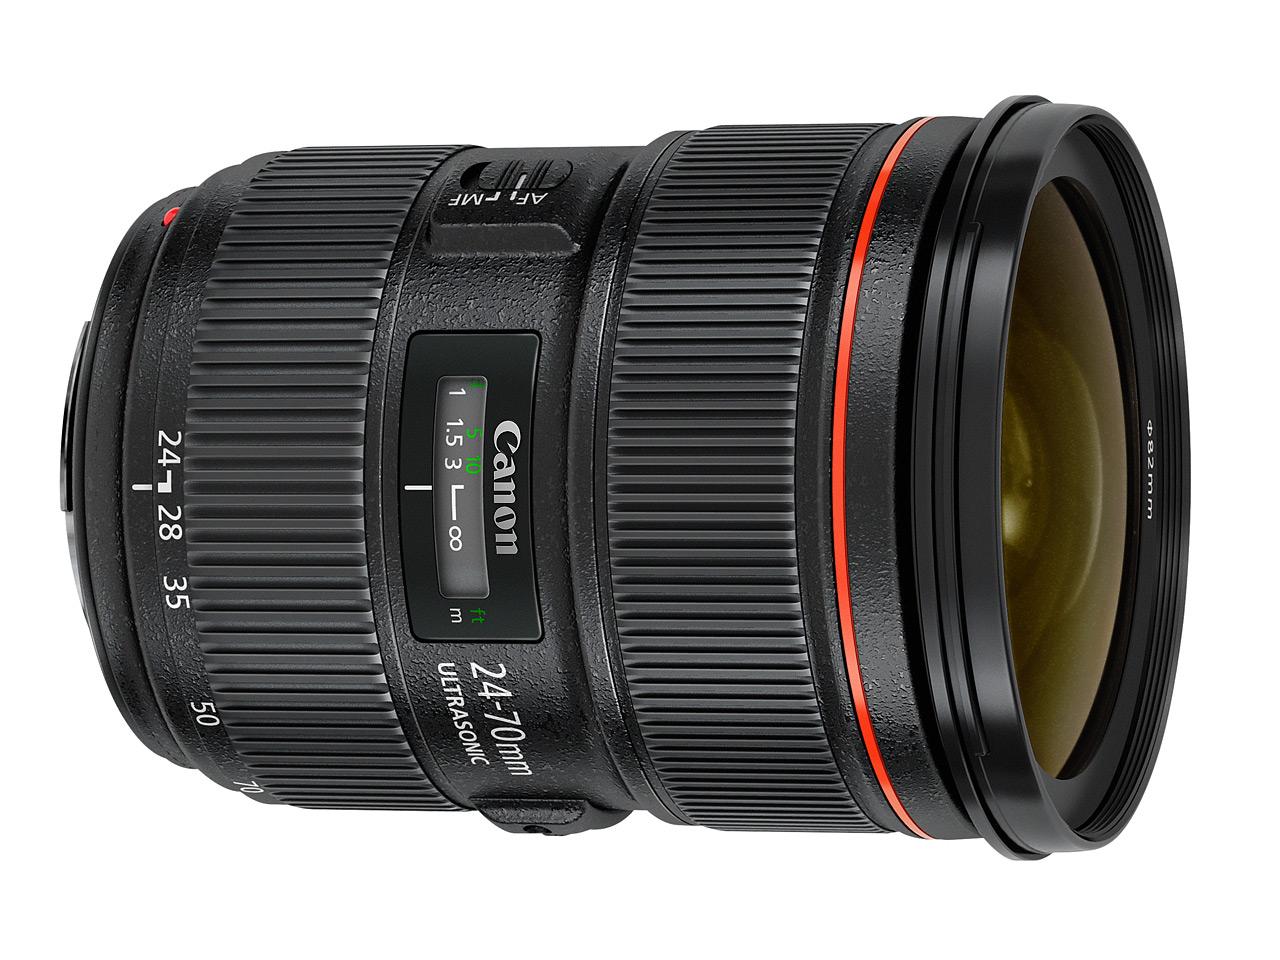 Canon EF 24-70mm f/2.8L II USM giá rẻ